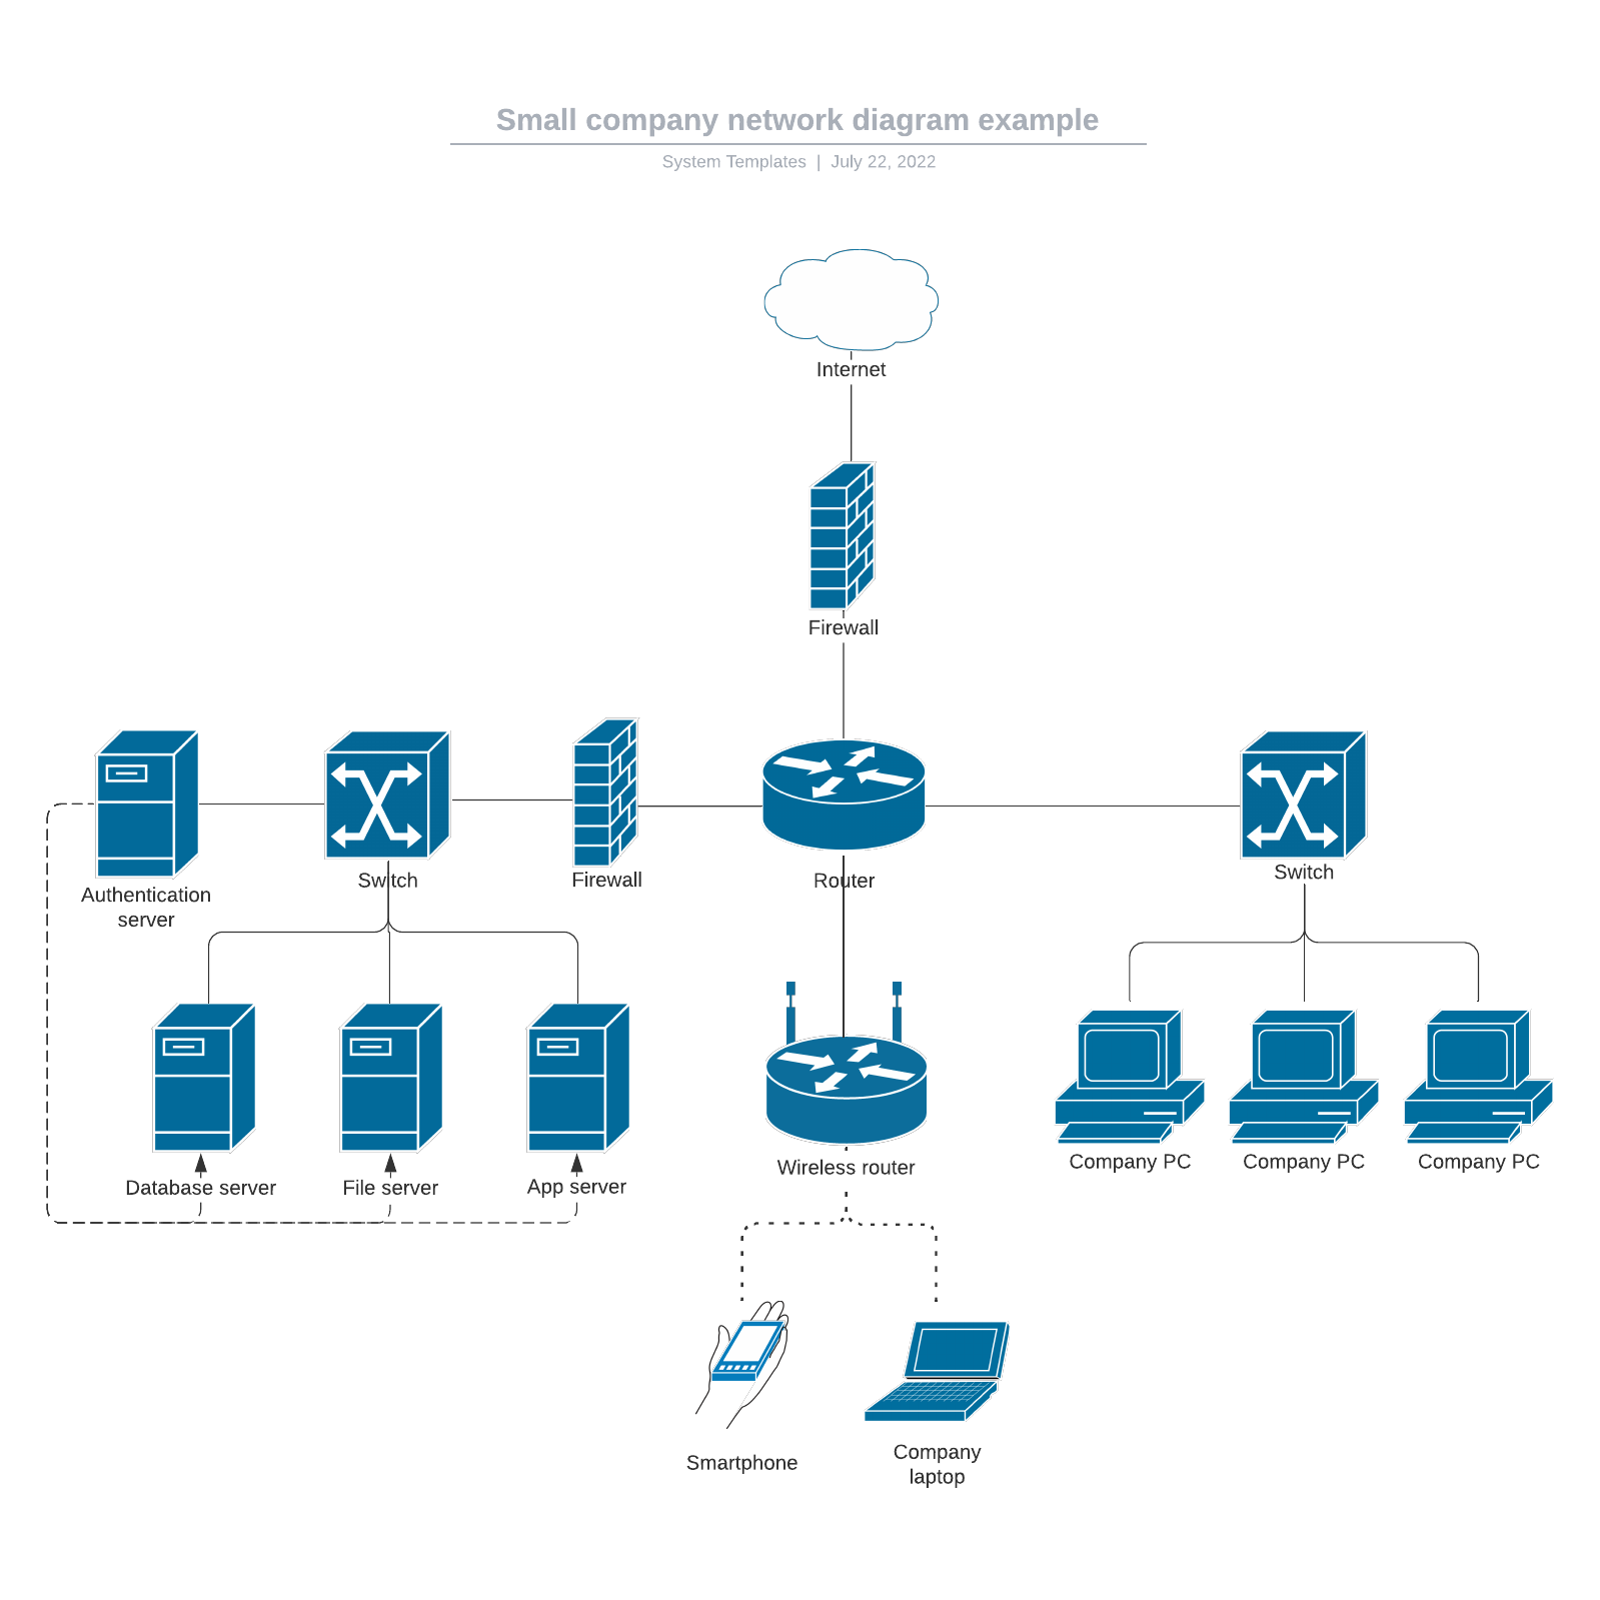 Small company network diagram example